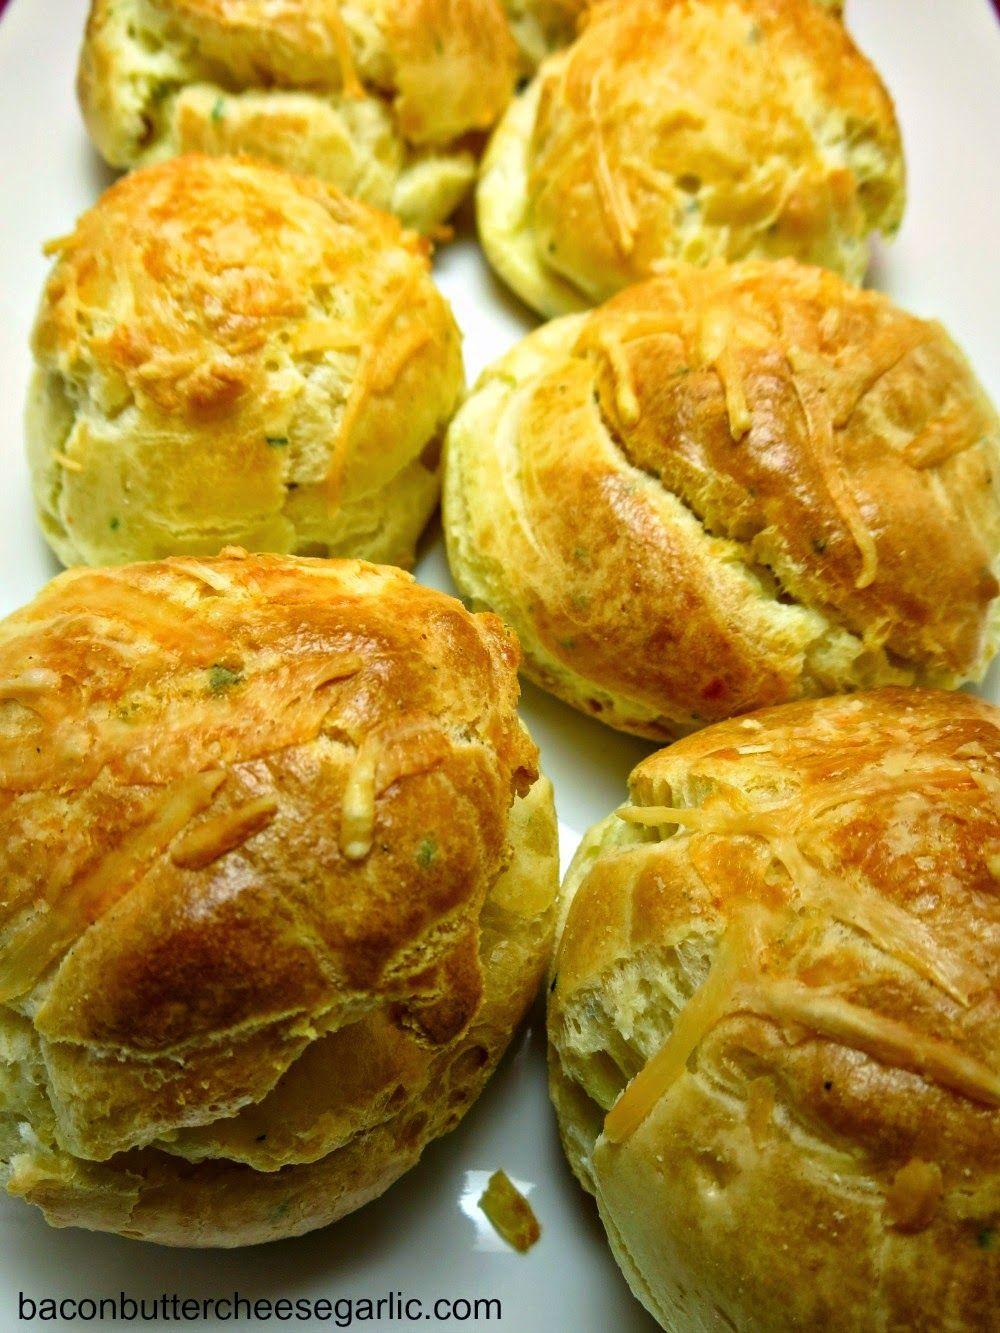 Bacon, Butter, Cheese & Garlic: Cheese Puffs